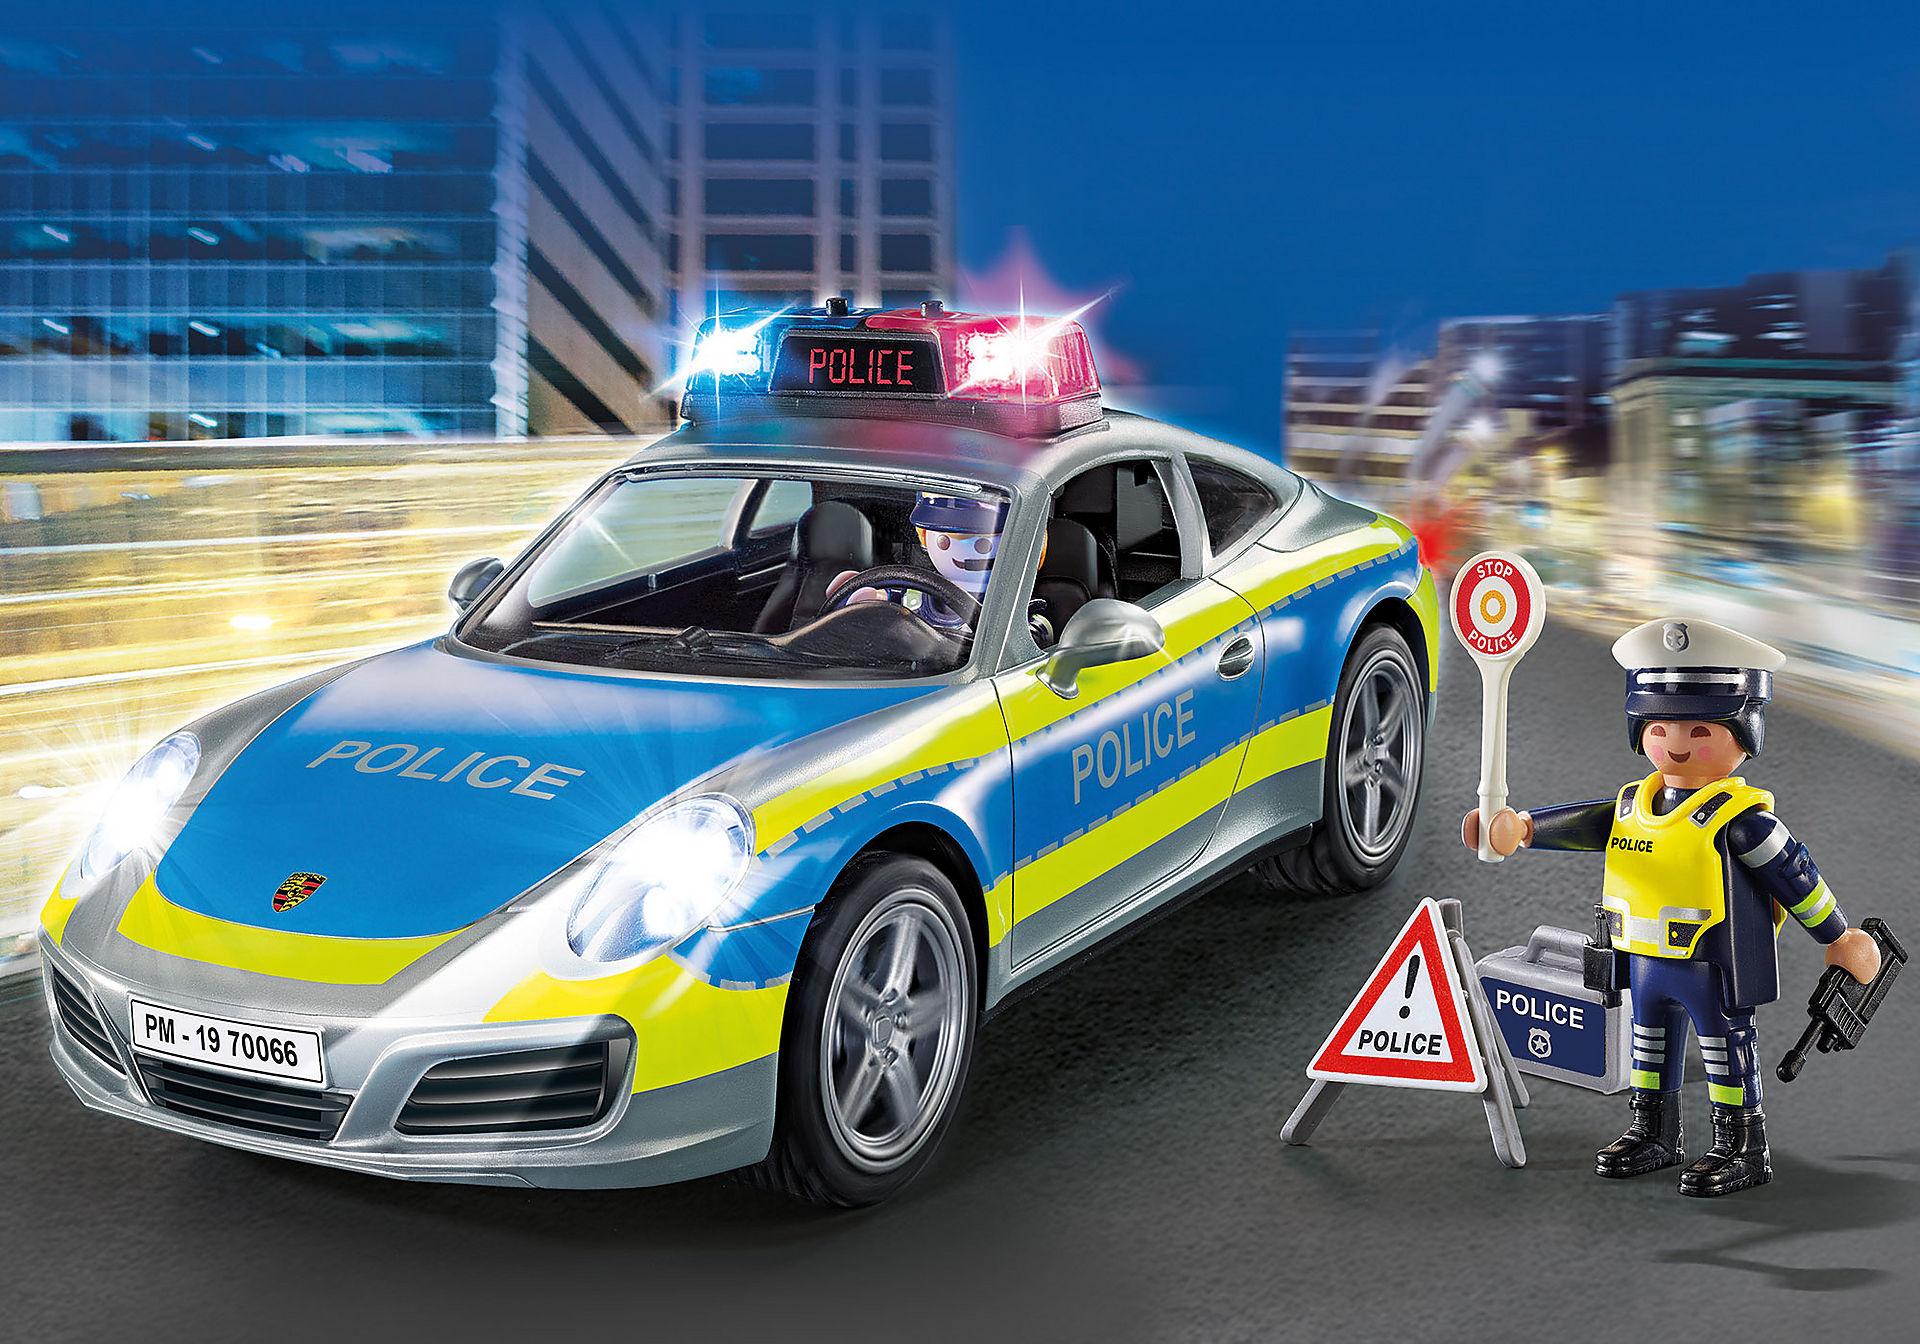 70066 Porsche 911 Carrera 4S Police zoom image1